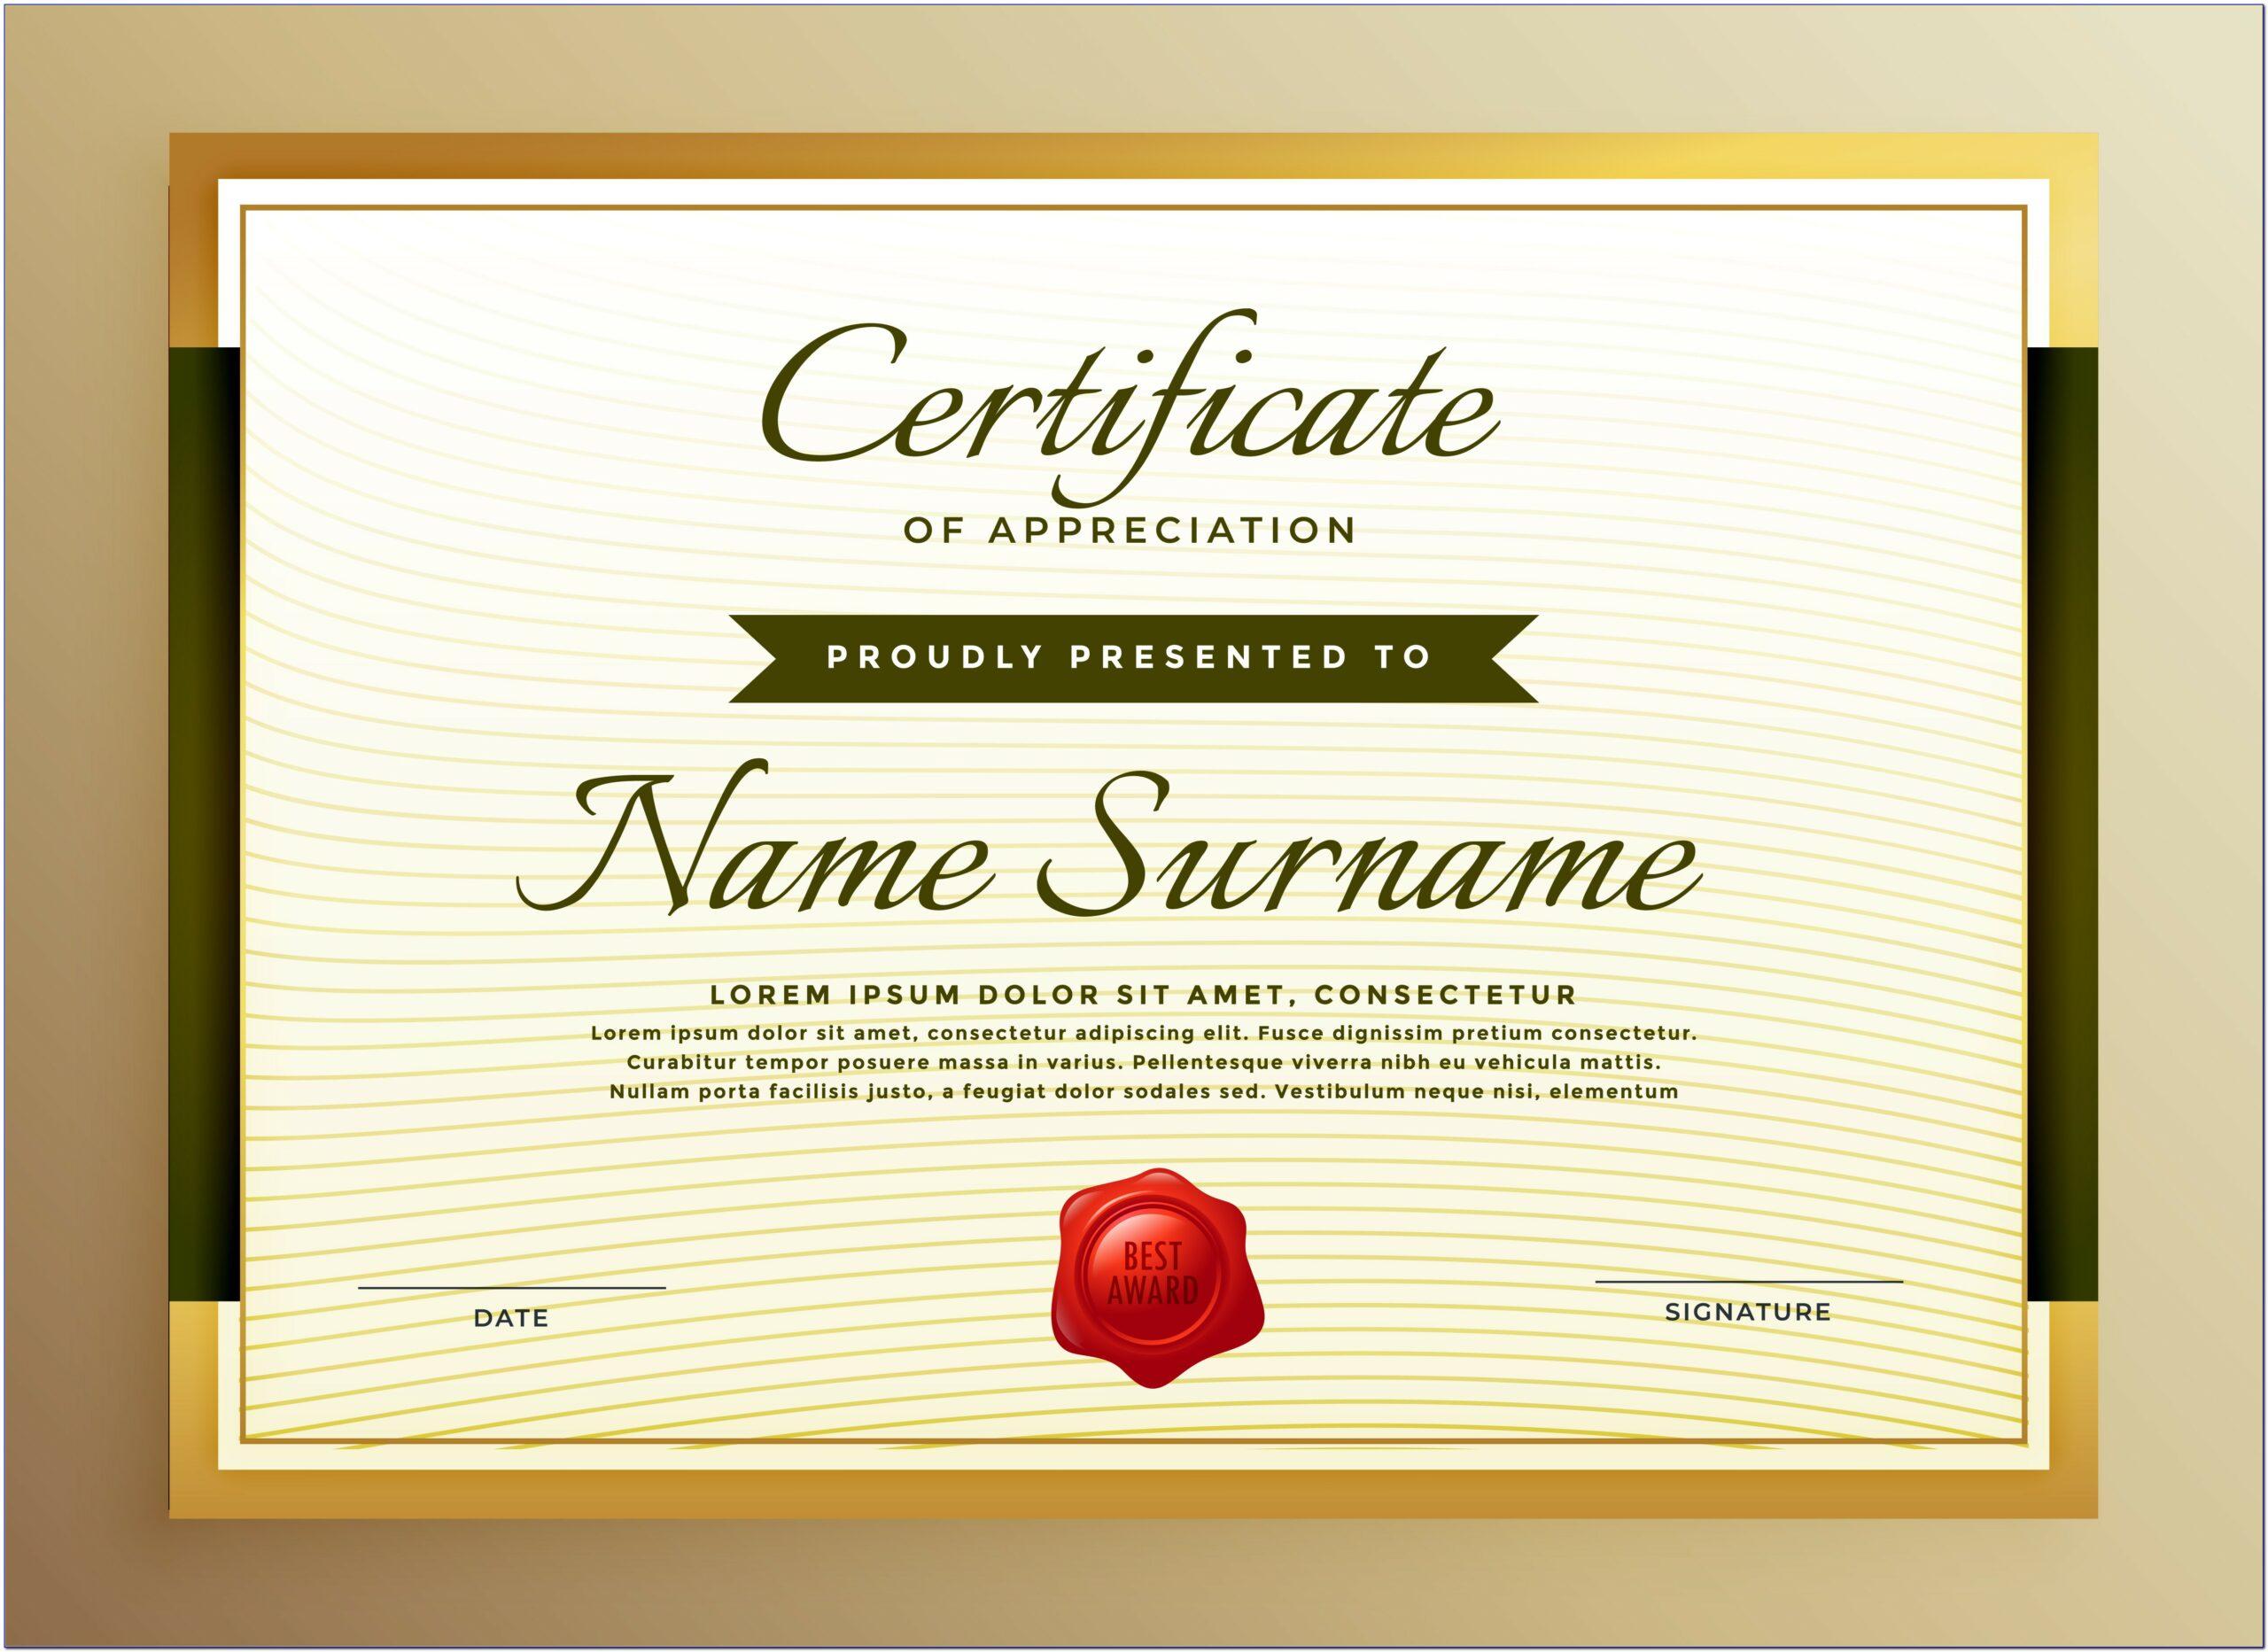 Certificates Of Appreciation For Teachers Templates